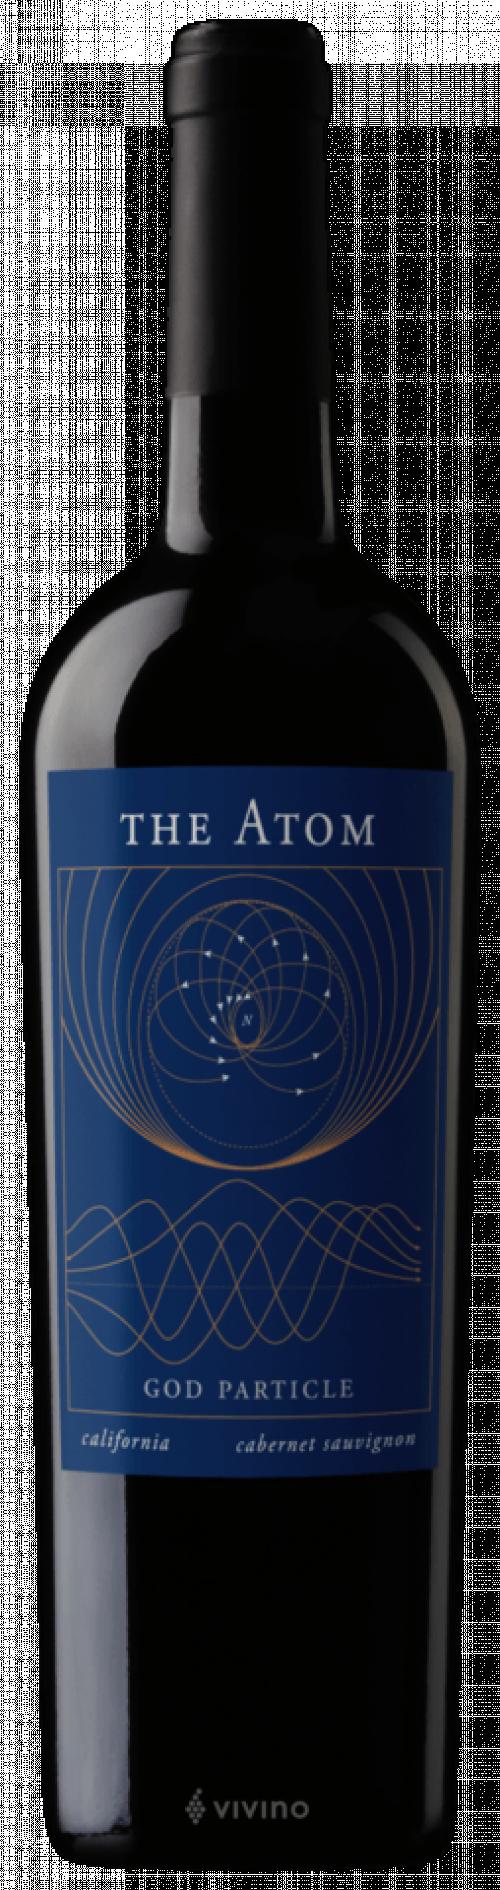 2018 The Atom God Particle Cabernet Sauvignon 750ml